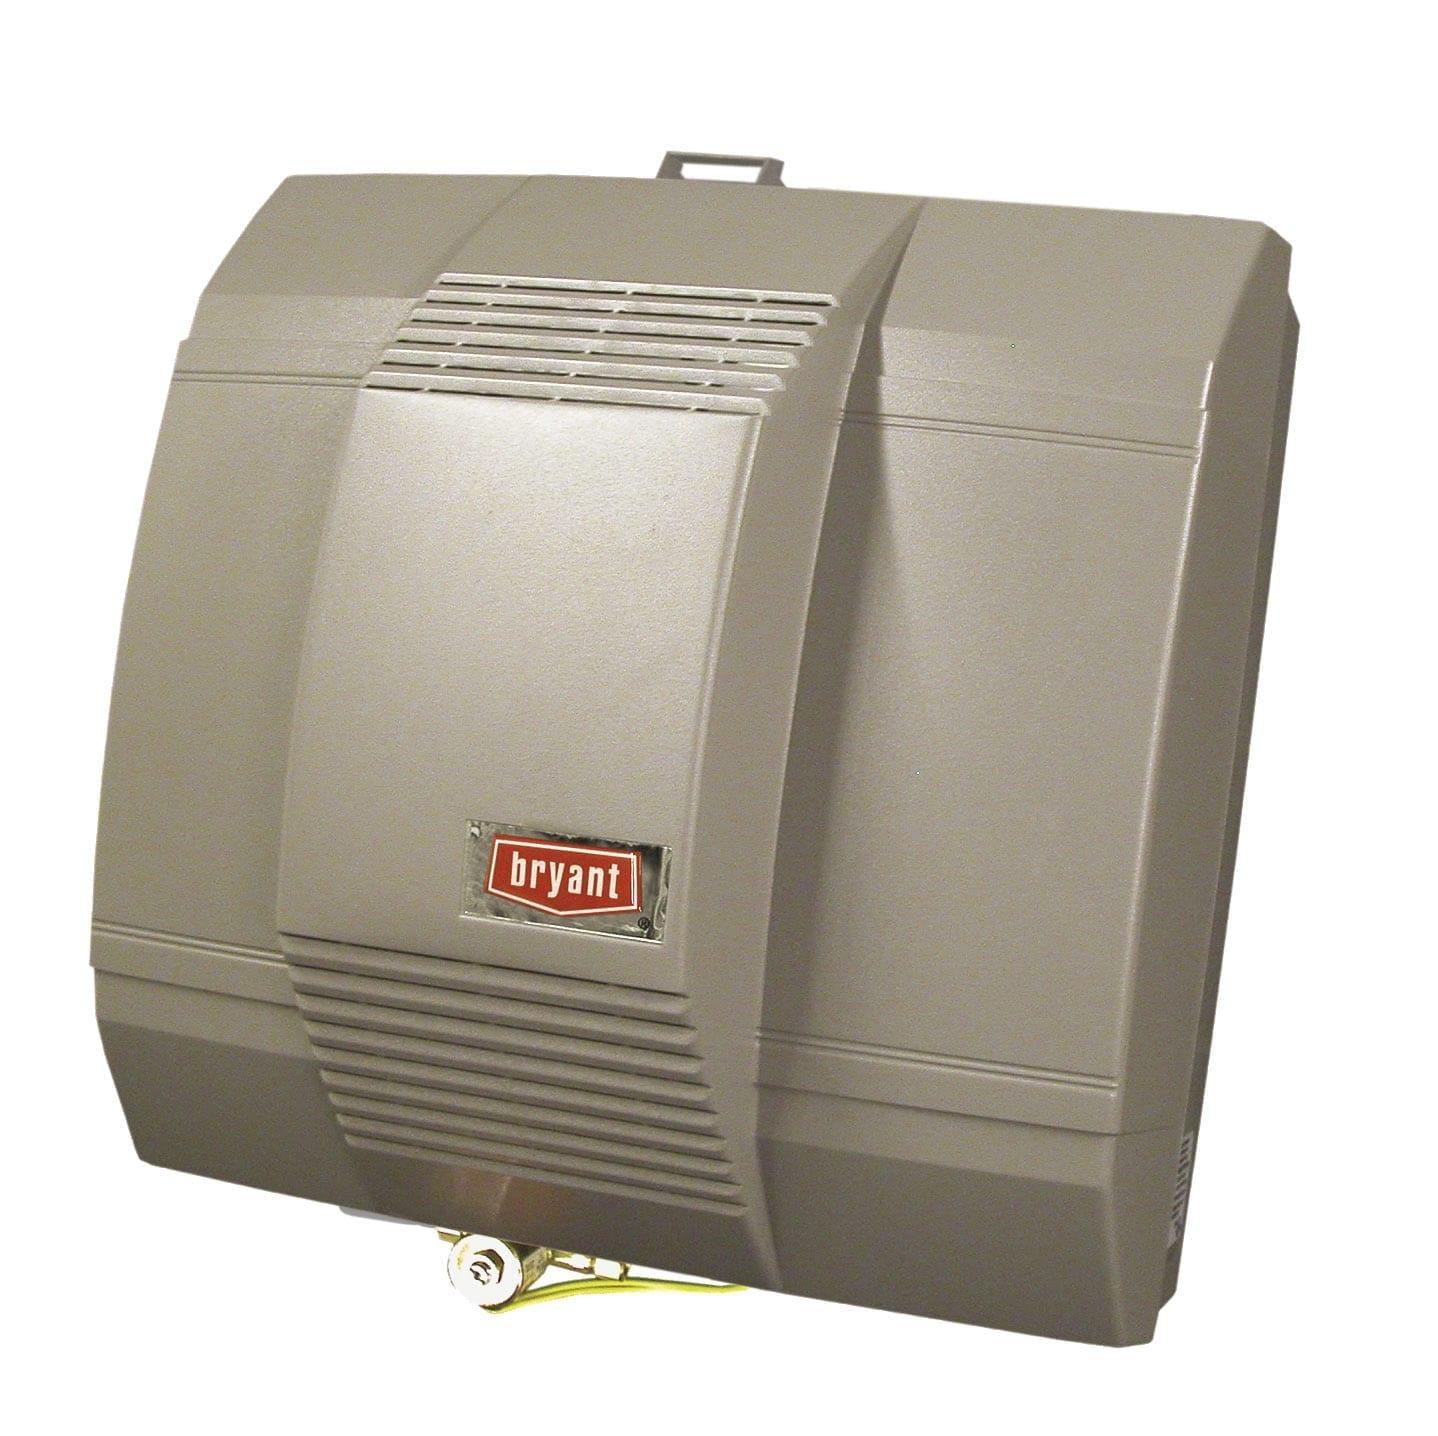 4) Whole House Humidifier